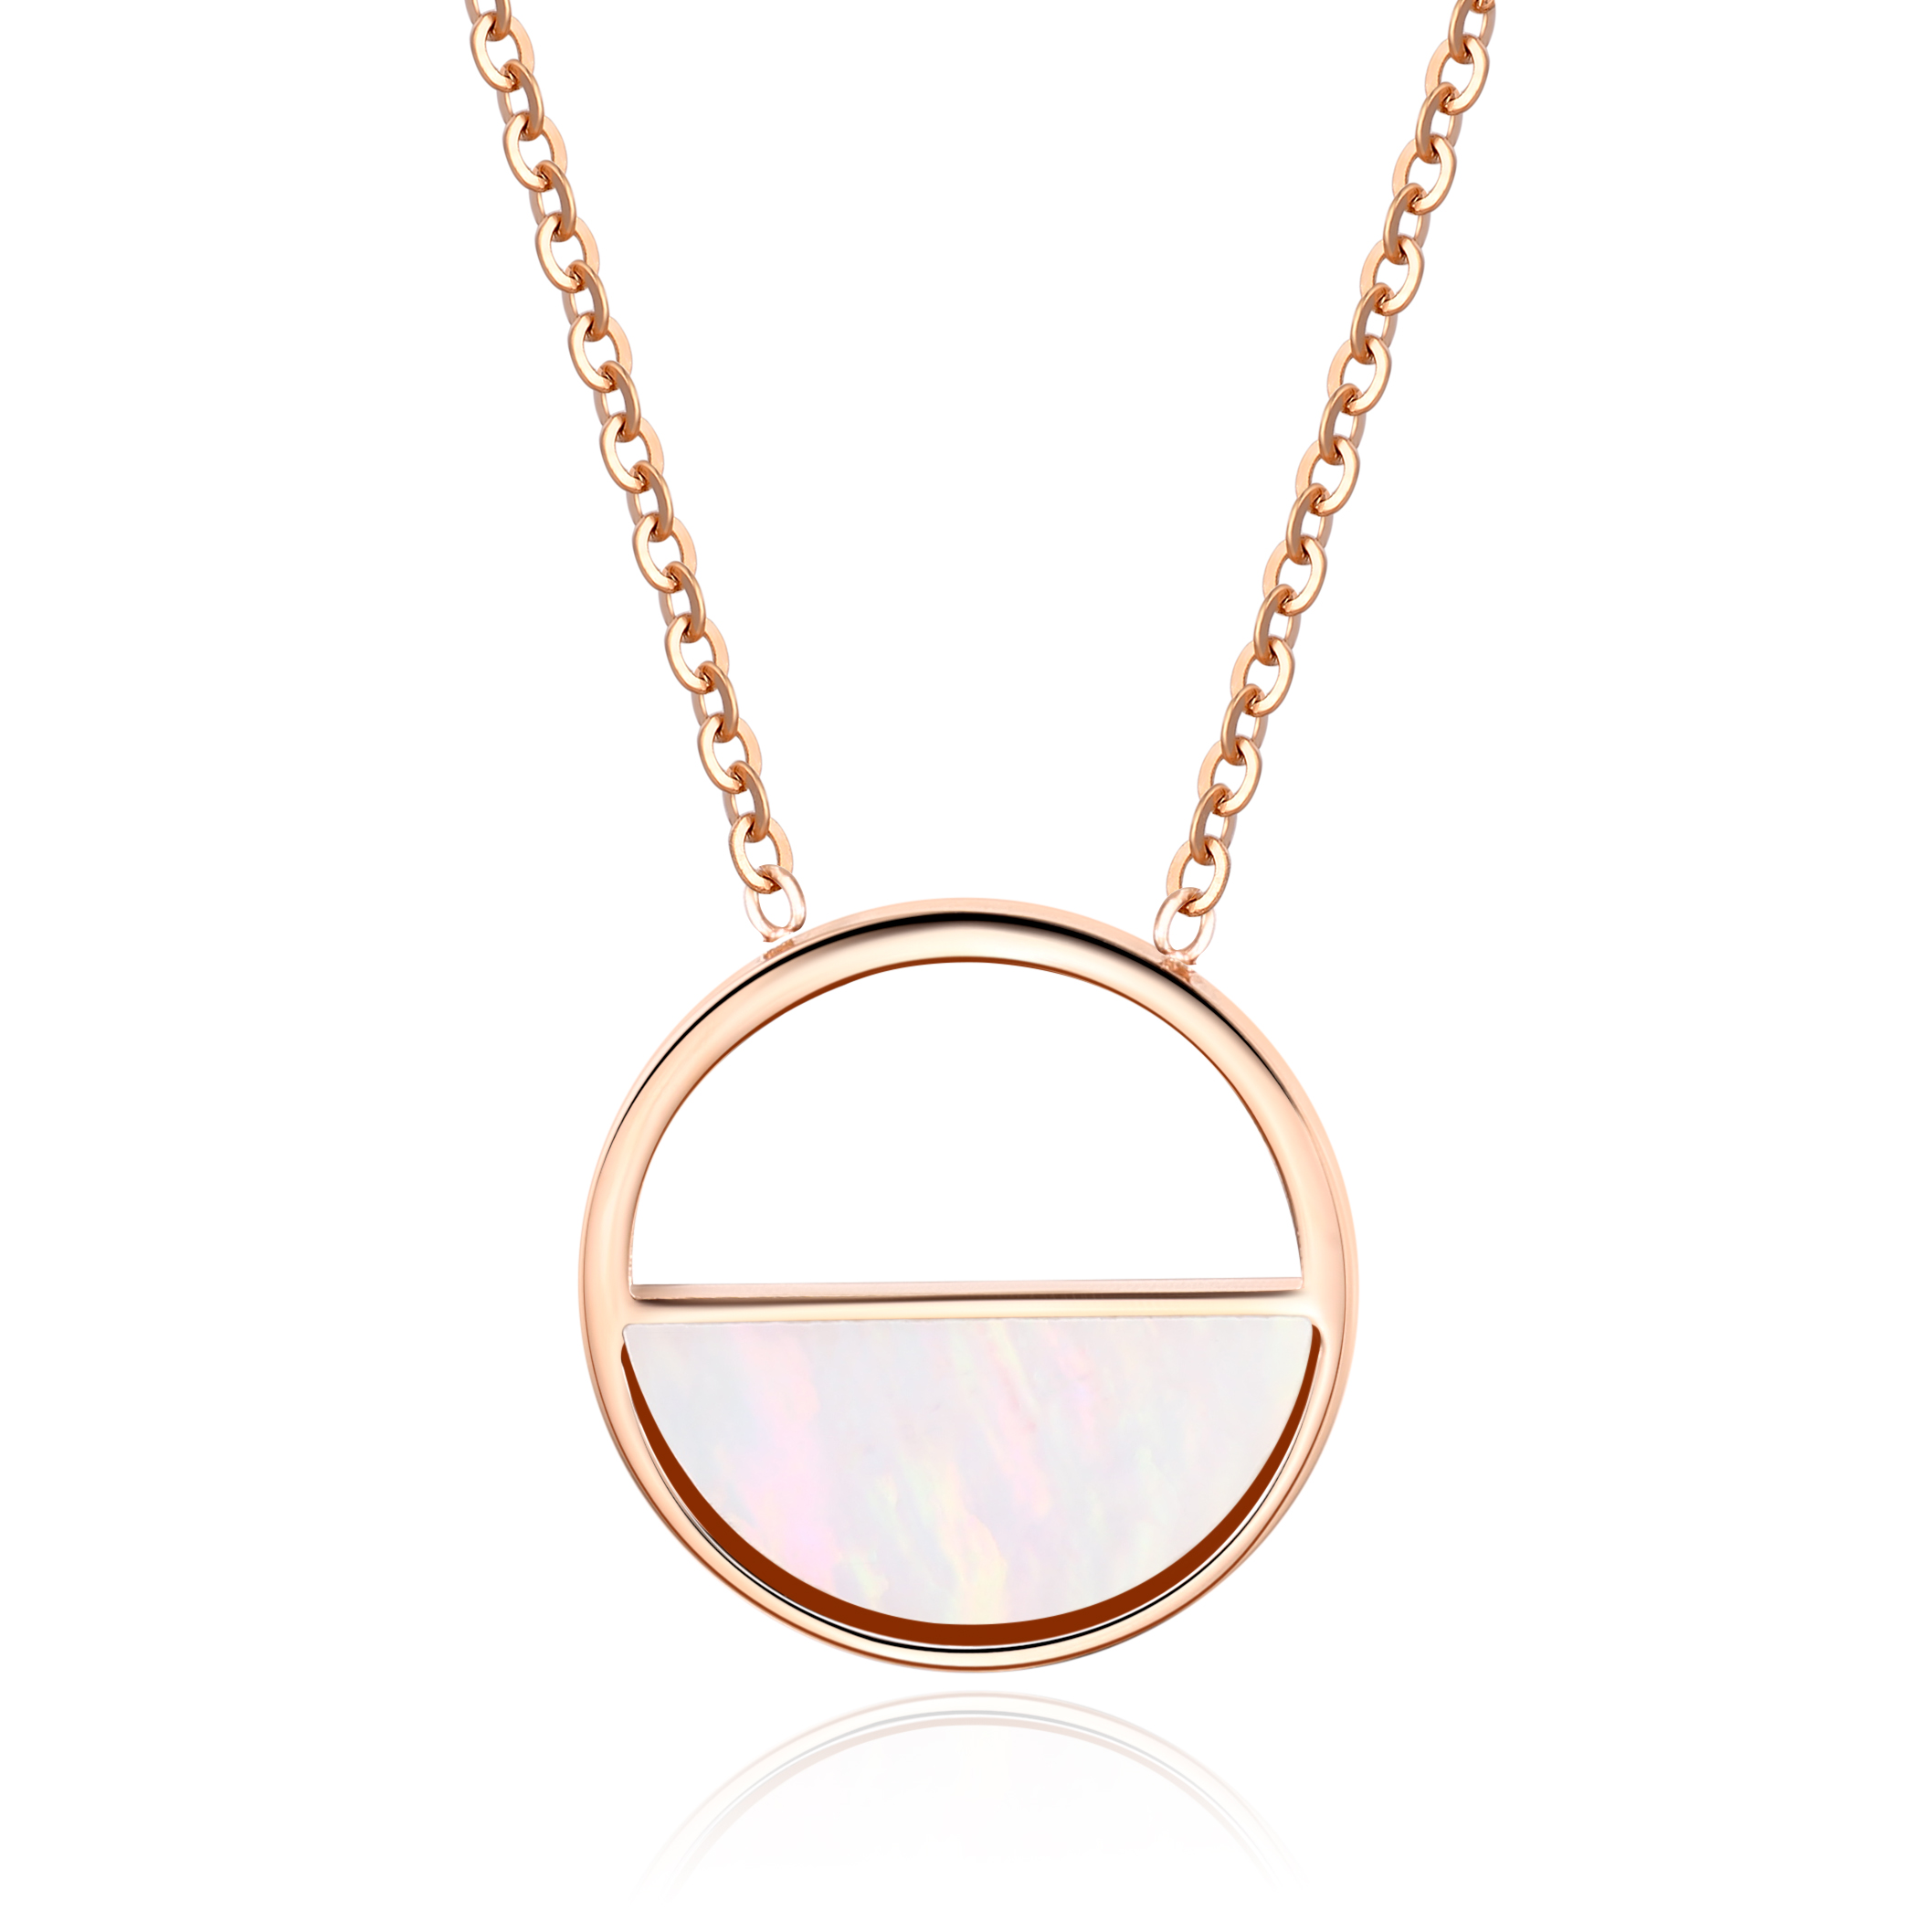 Seashell Necklace Ros Gold Victoria Grey